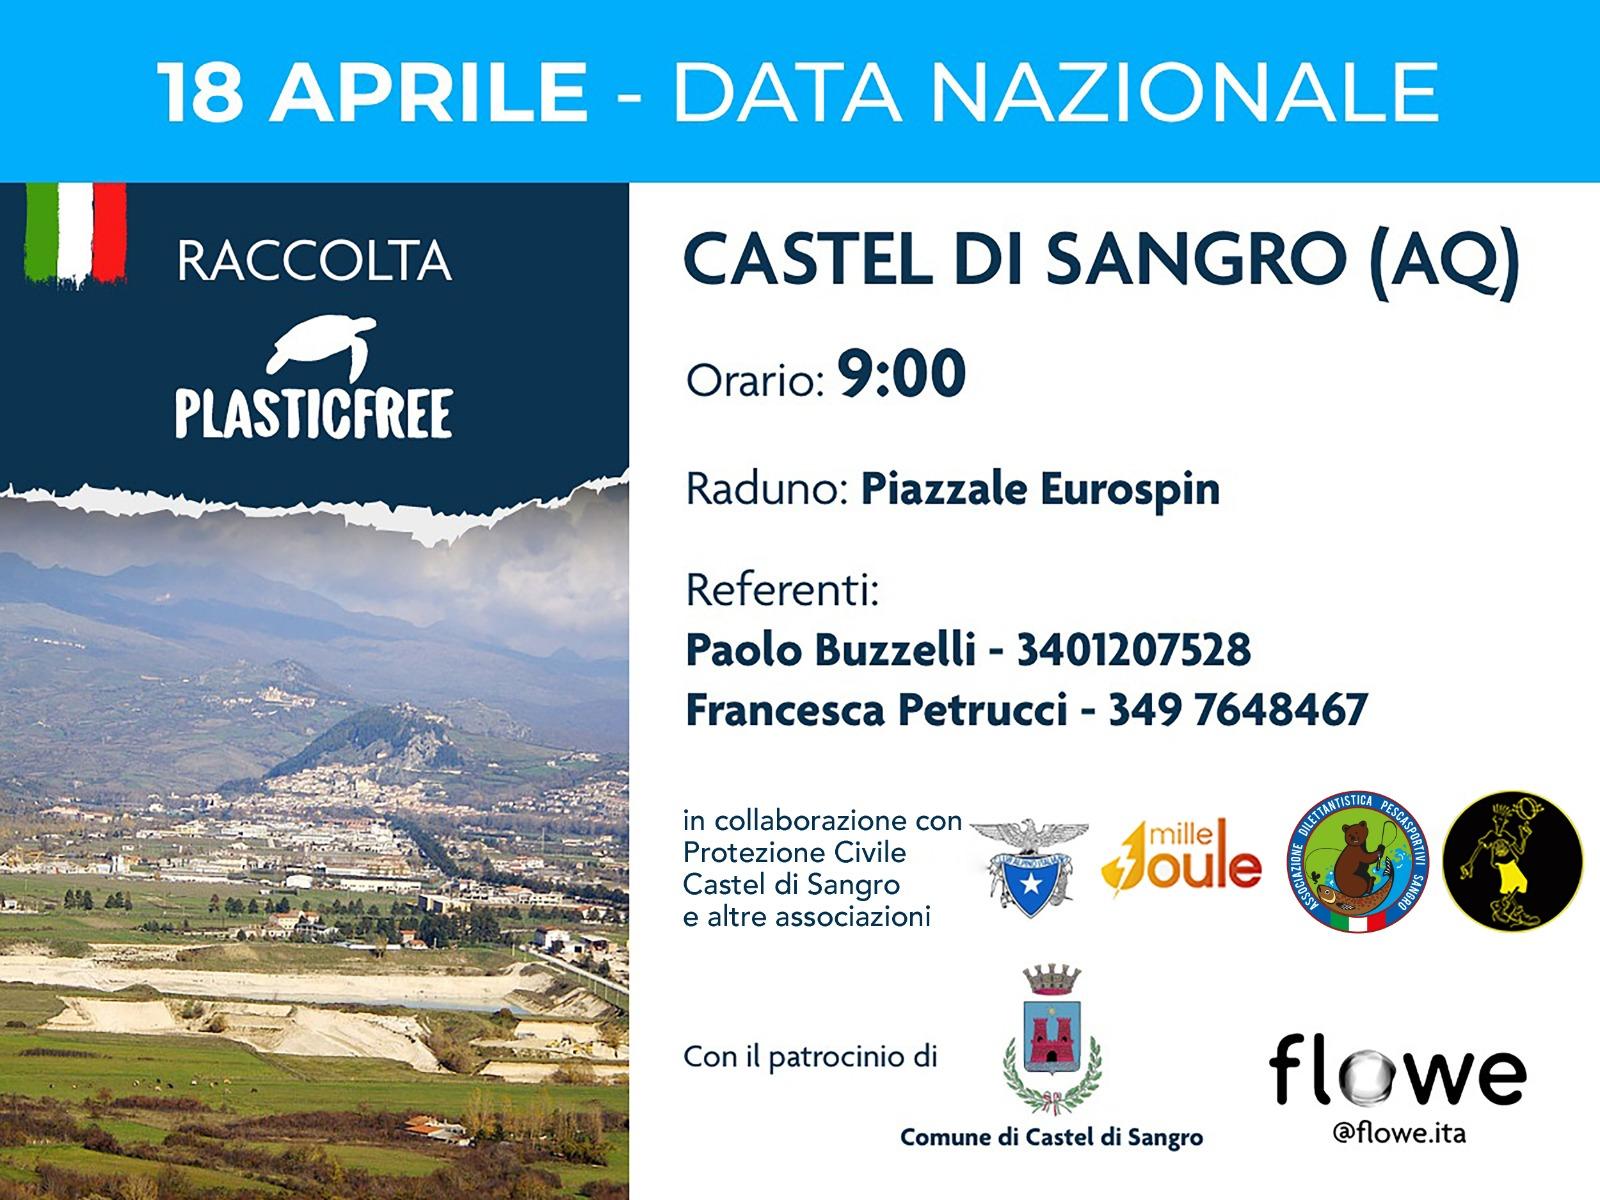 Raccolta Plastic free Castel di Sangro